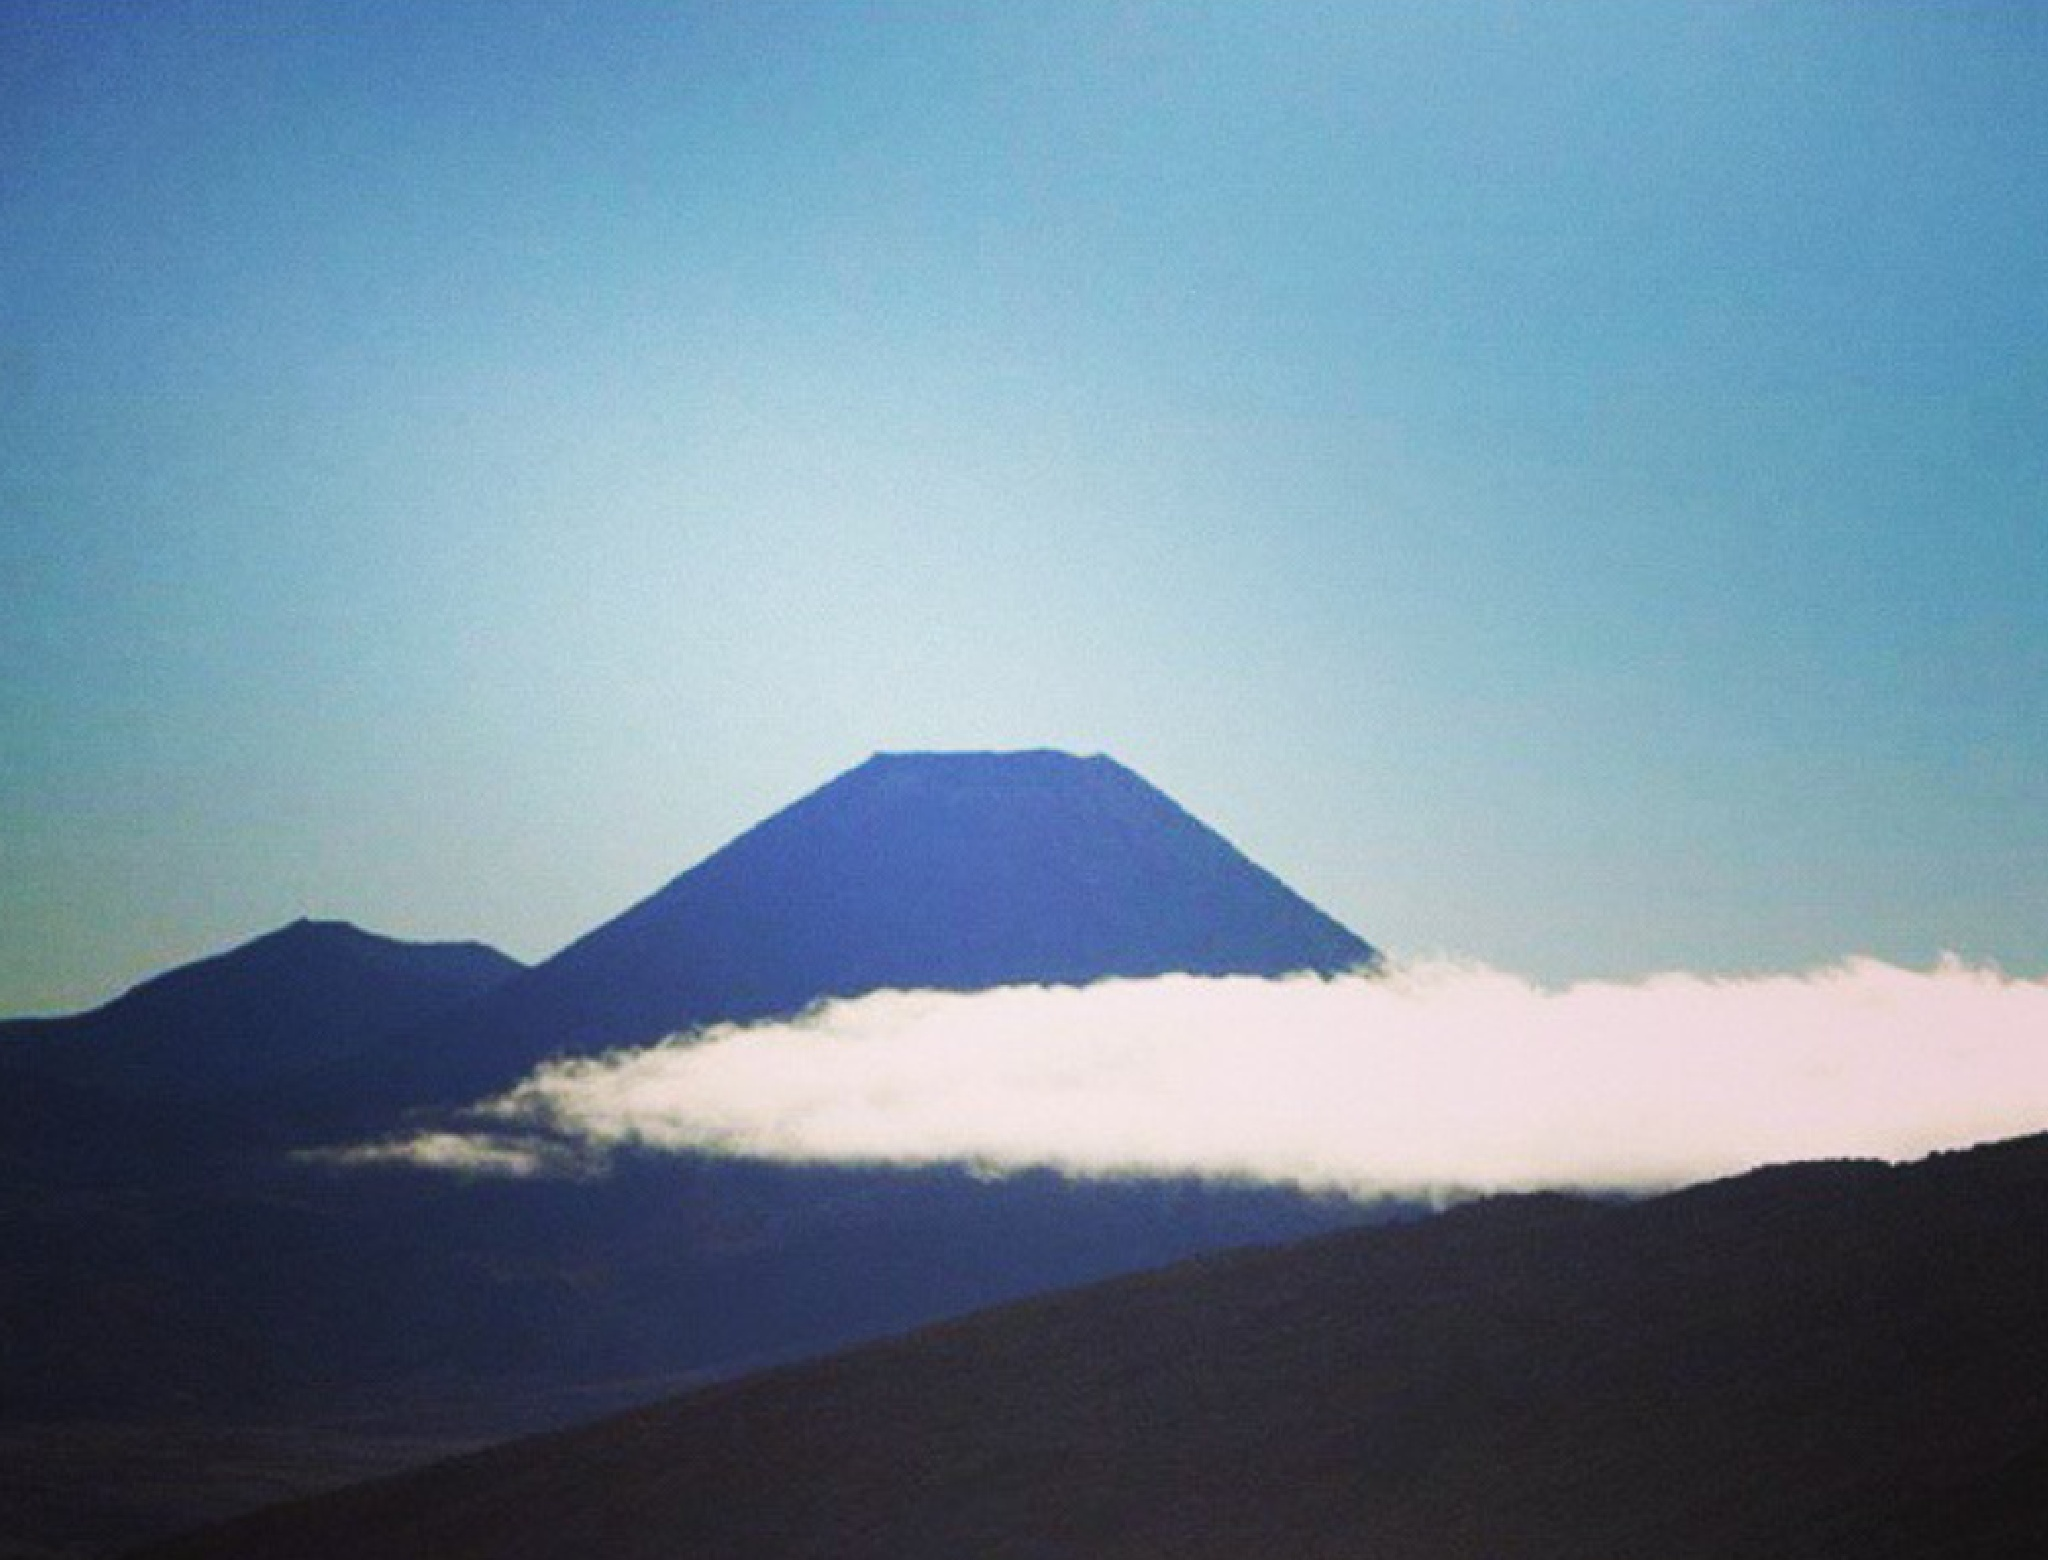 The Land Of The Long White Cloud - Aotearoa by Hannah McDonagh